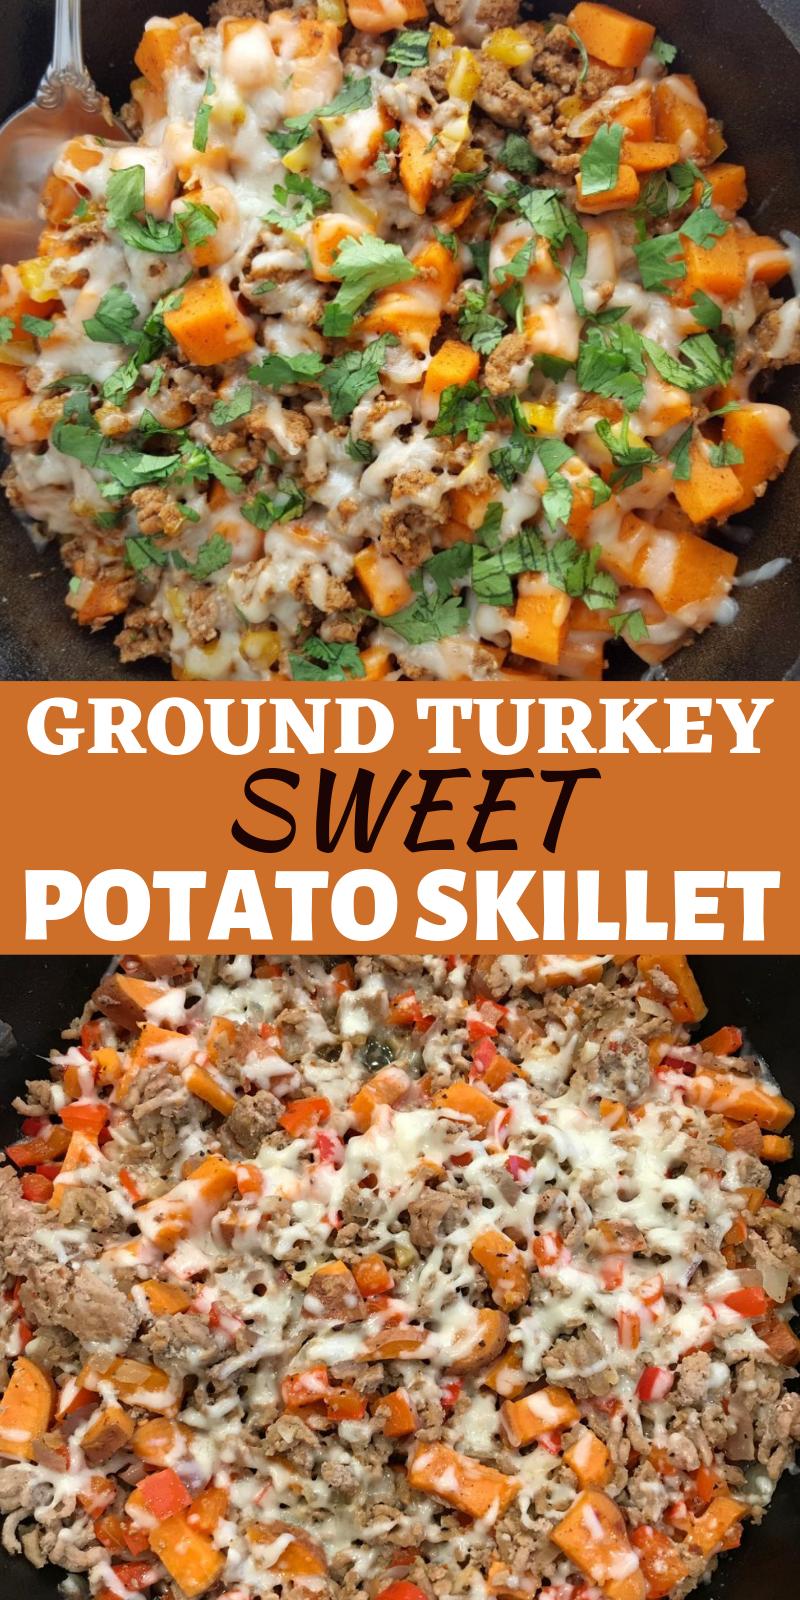 GROUND TURKEY SWEET POTATO SKILLET | Healthy turkey ...